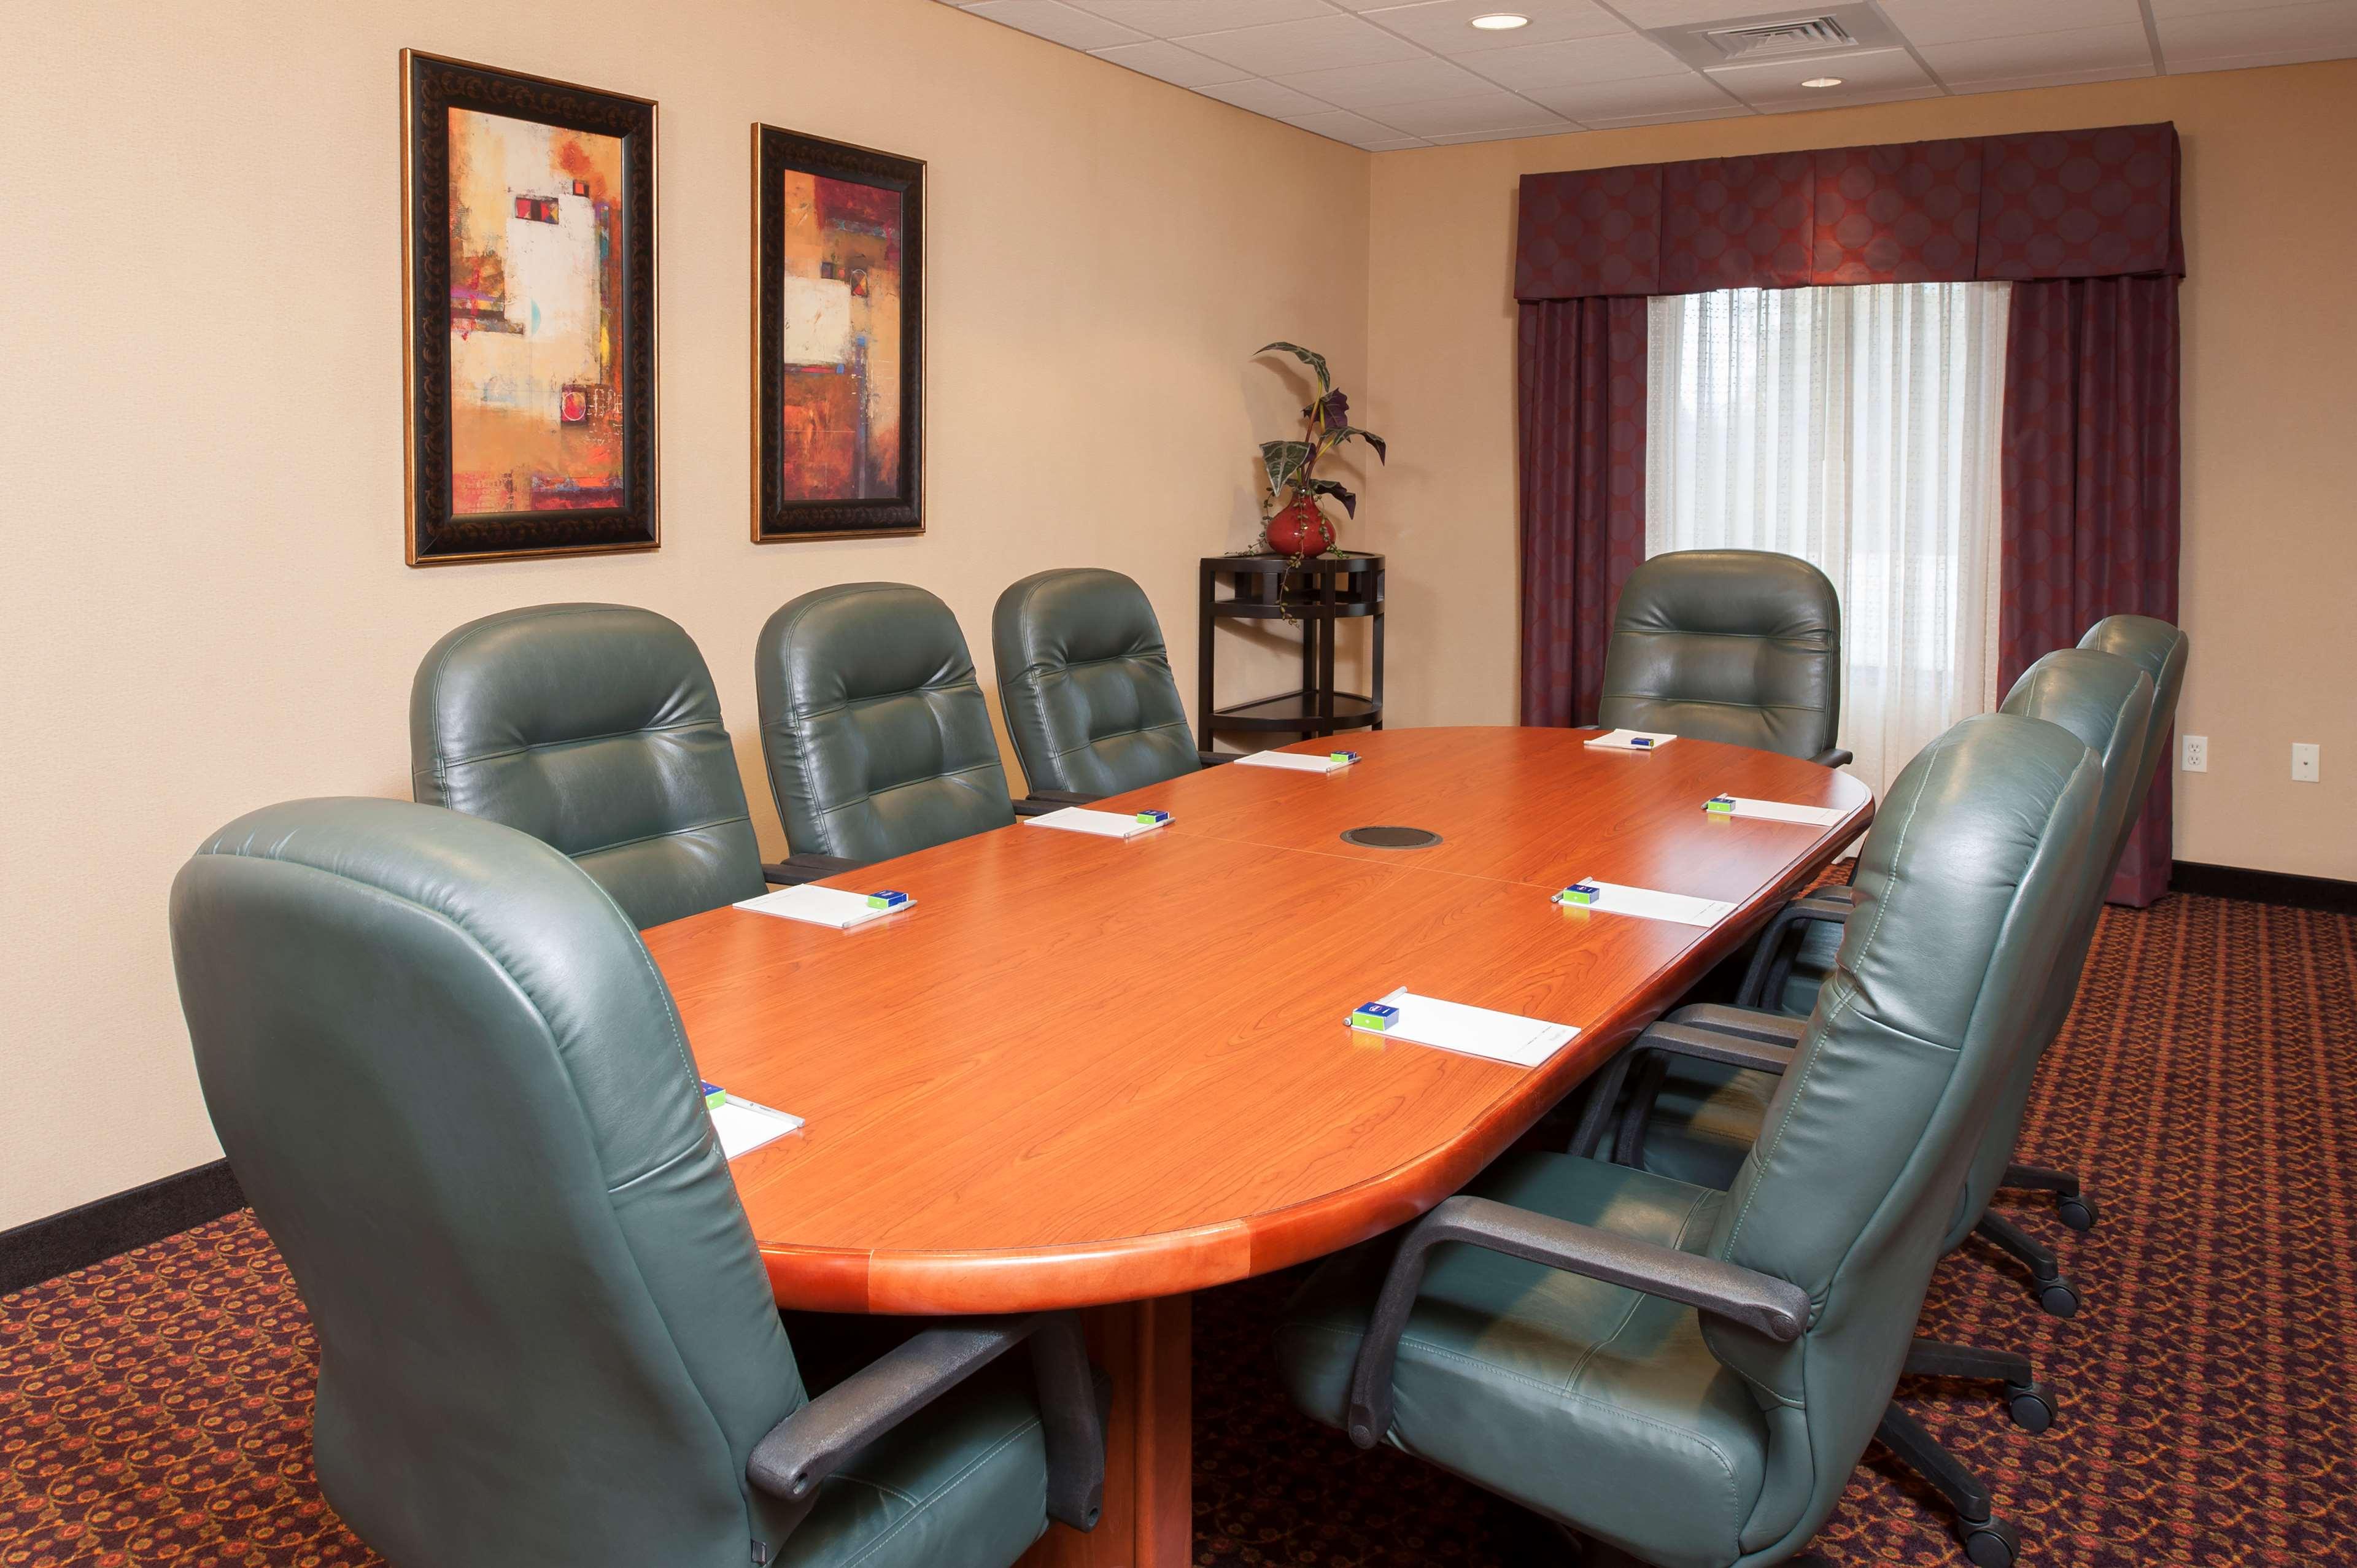 Hampton Inn & Suites Grand Rapids-Airport 28th St image 11